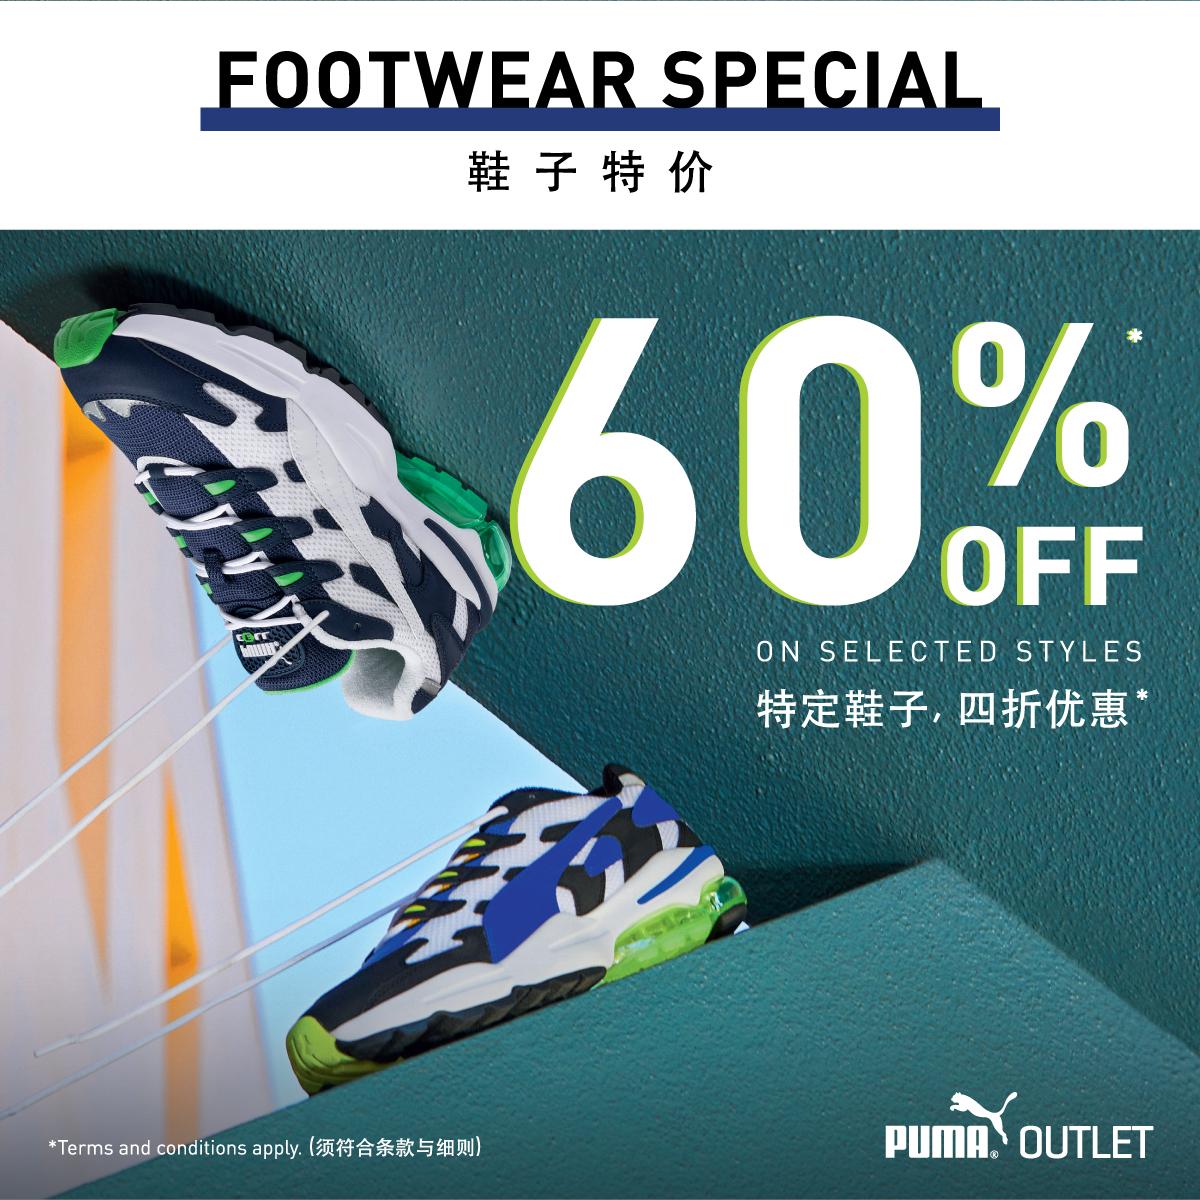 PUMA-FOC_FOOTWEAR-SPECIAL-60%-OFF_SS20_Social-Media_1200x1200